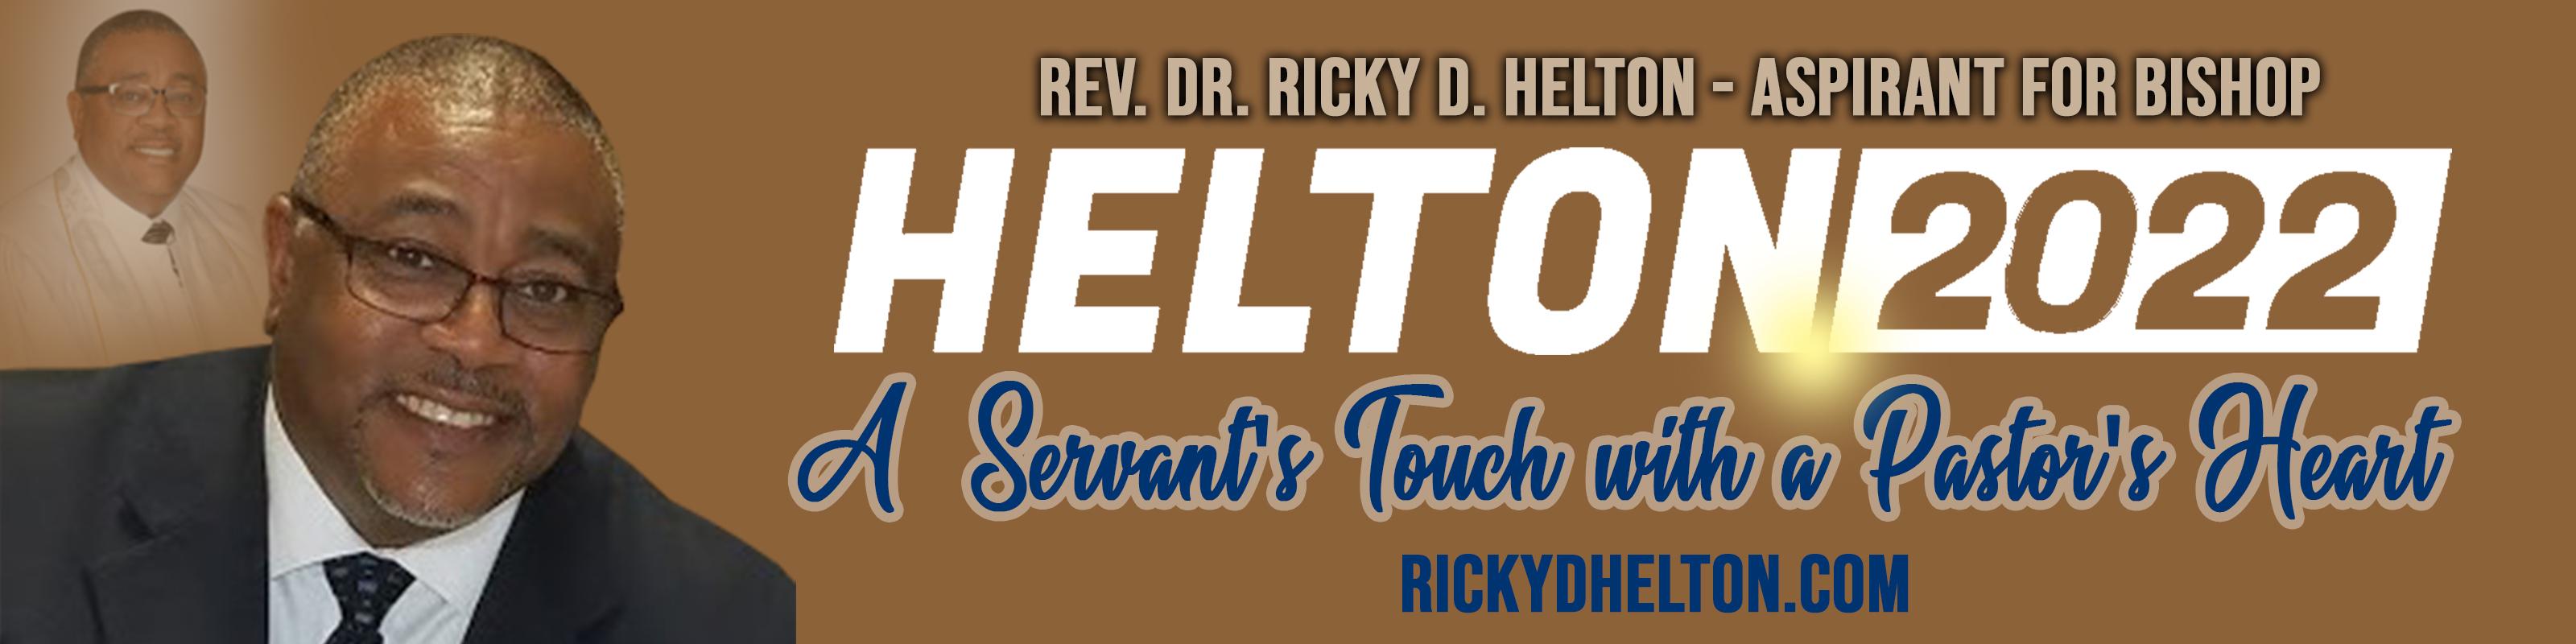 Helton 2022 Banner